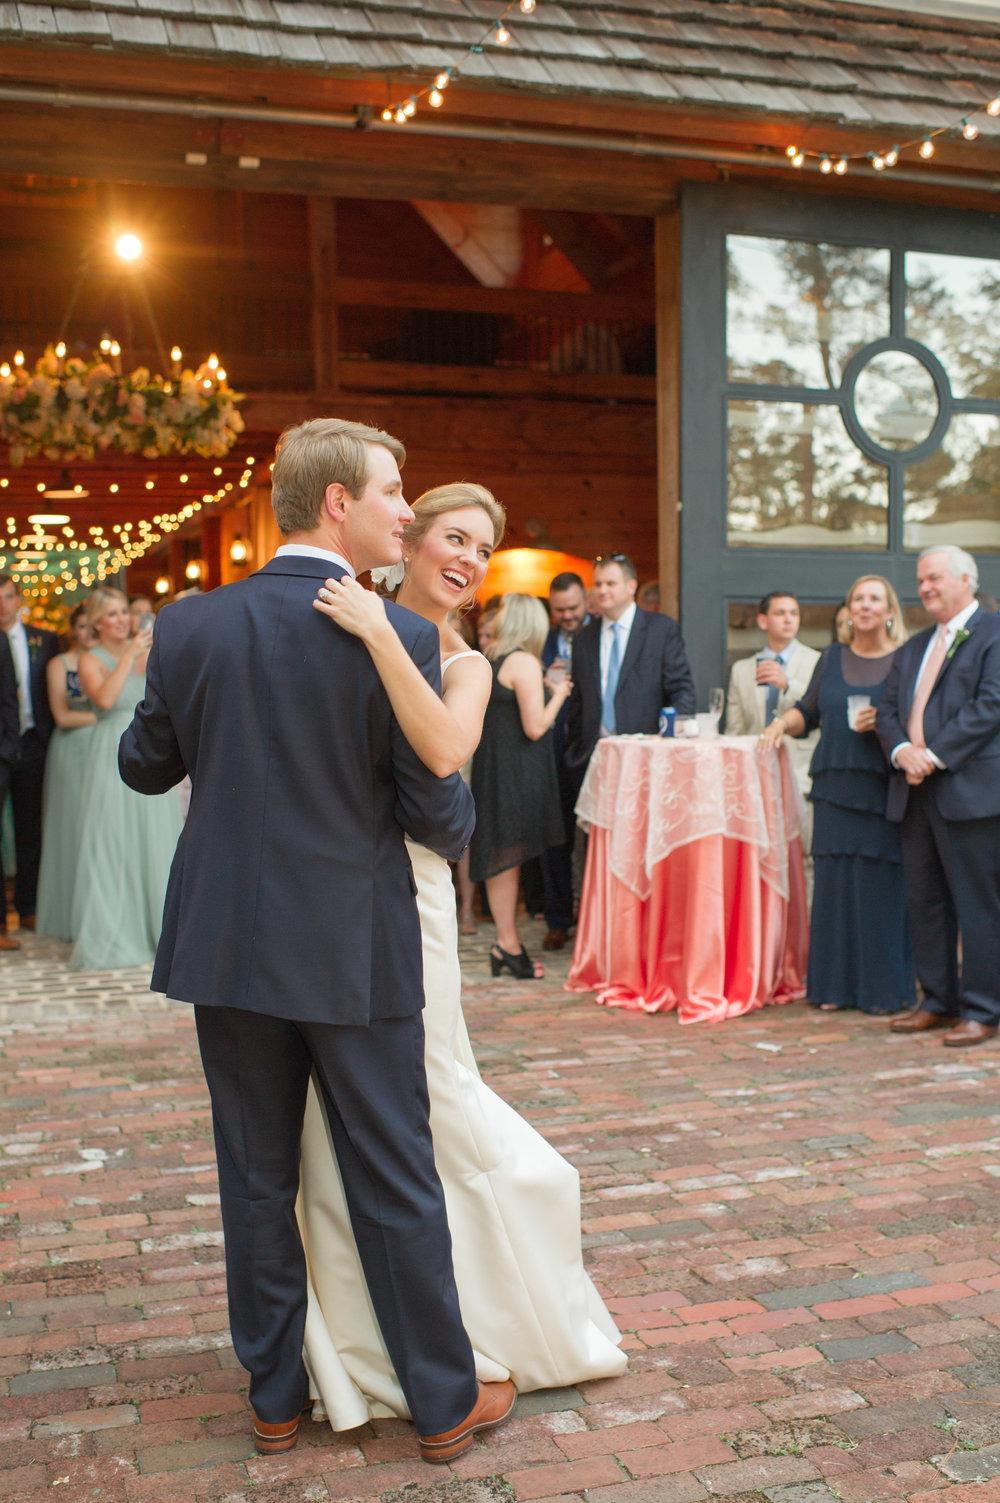 Handley Breaux Designs | Southern Wedding | Southern Bride